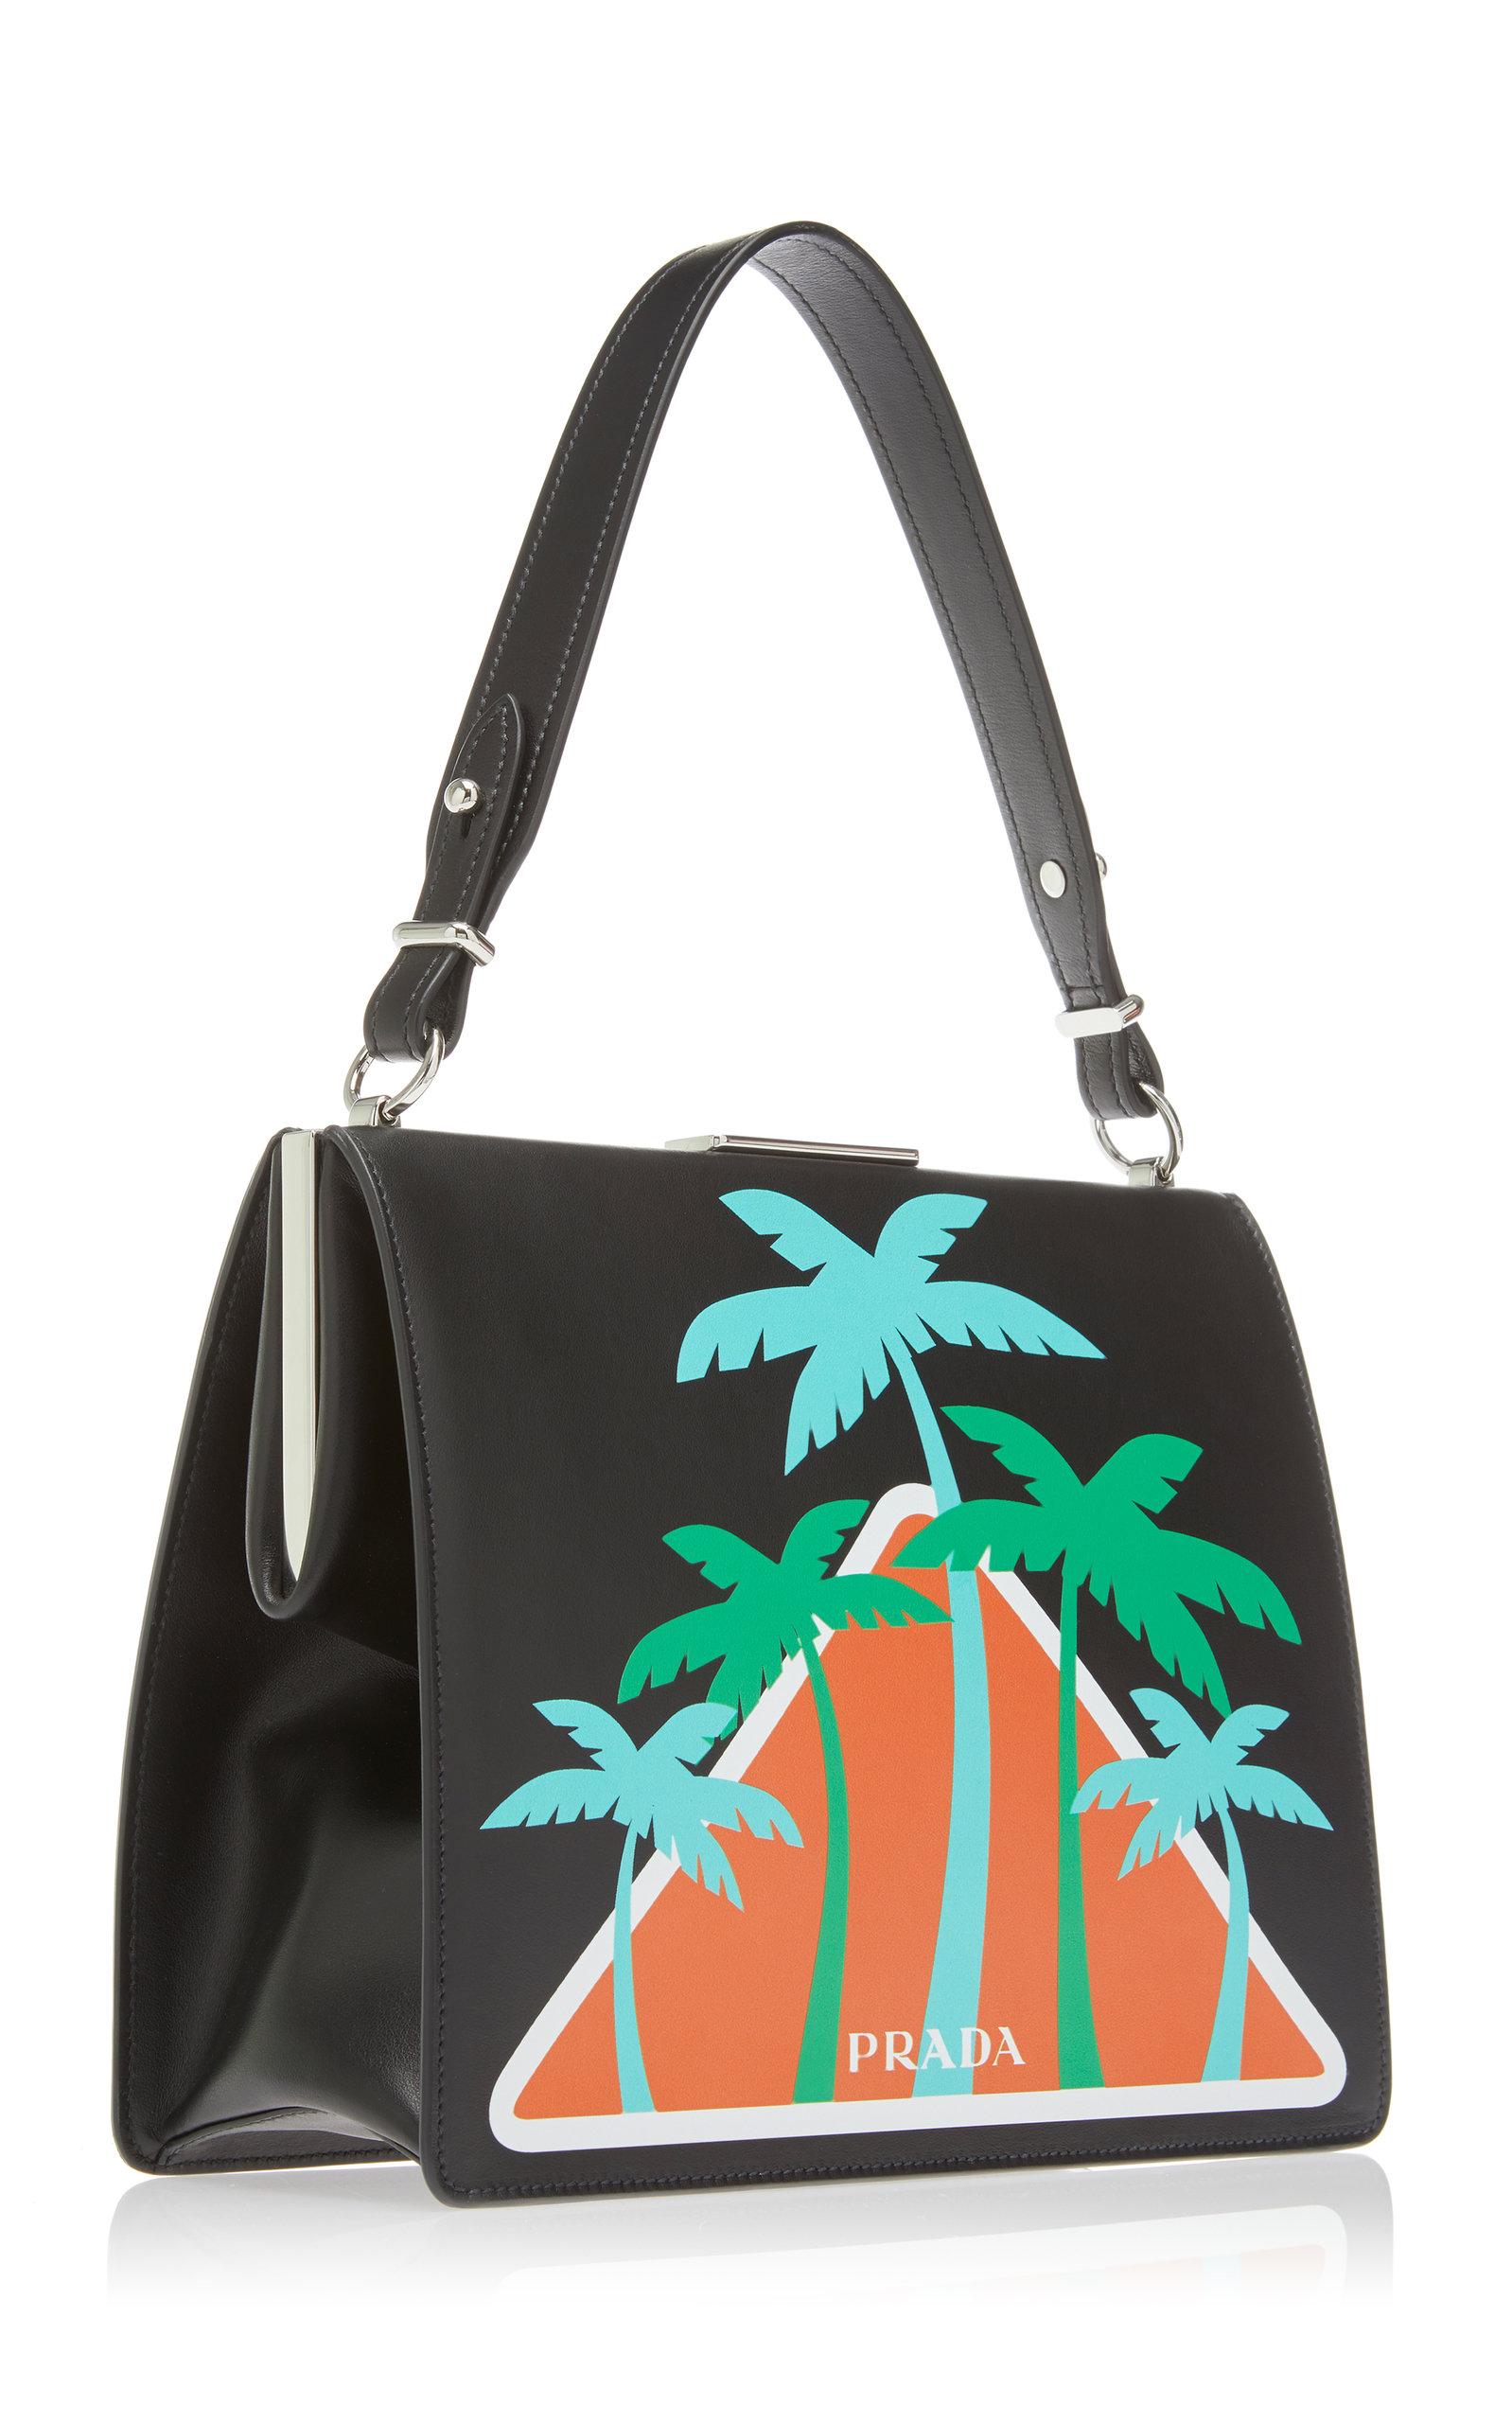 8130114c9d06 City Calf Top Handle with Palm Trees by Prada | Moda Operandi